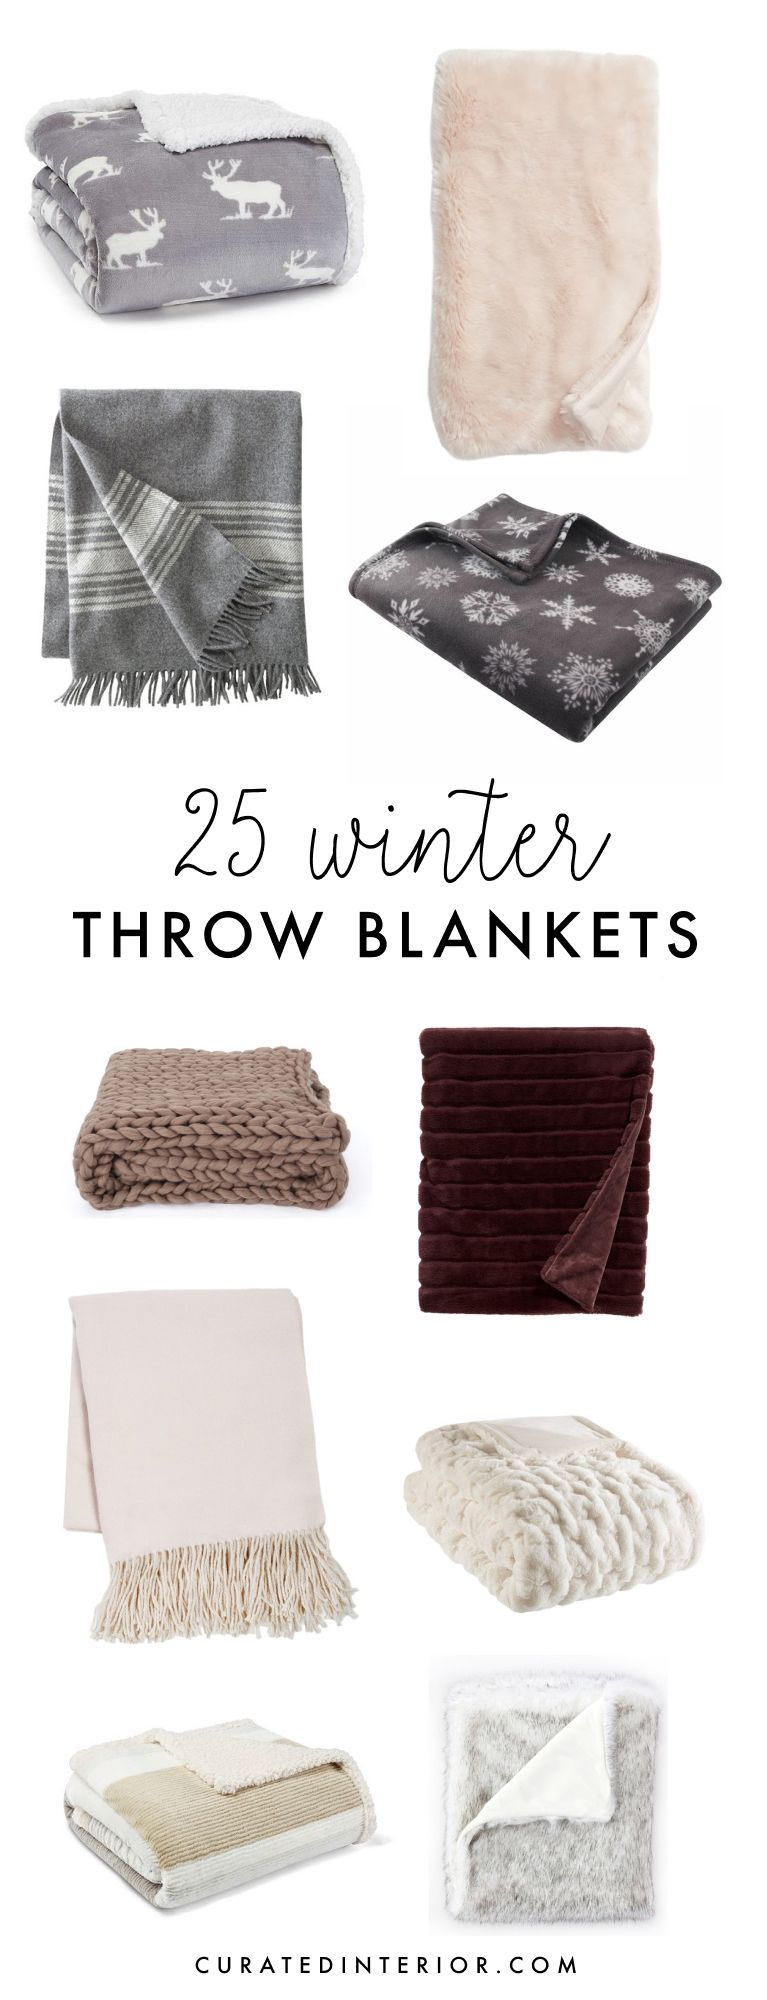 25 Winter Throw Blankets